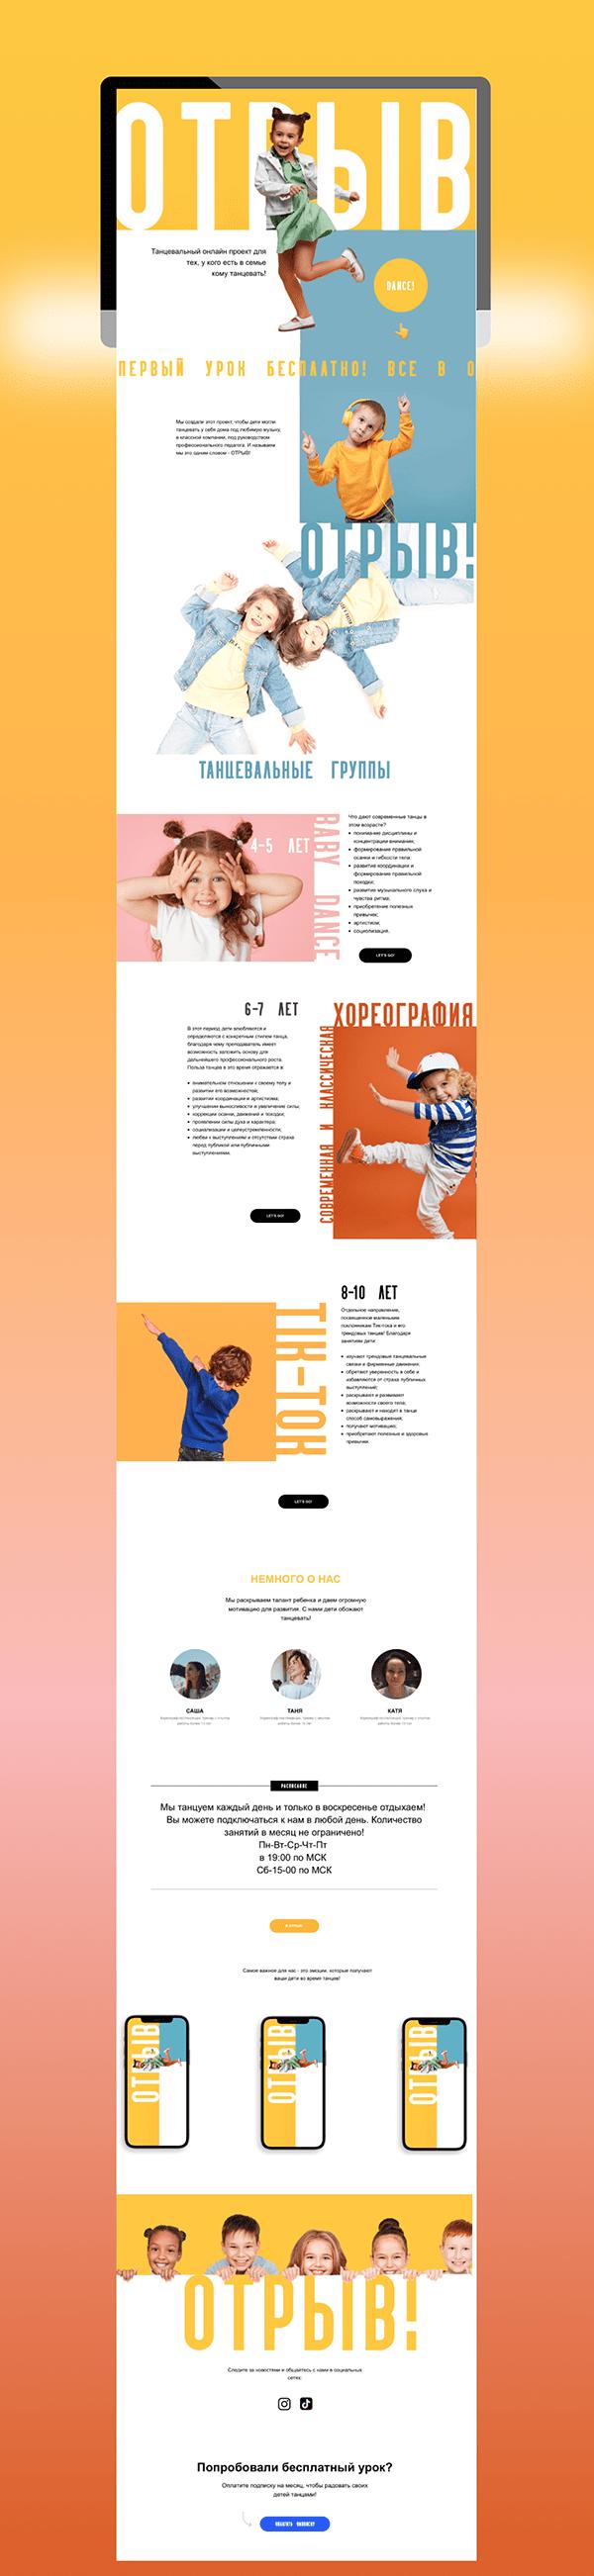 """ОТРЫВ"" web design for site online dance lessons."